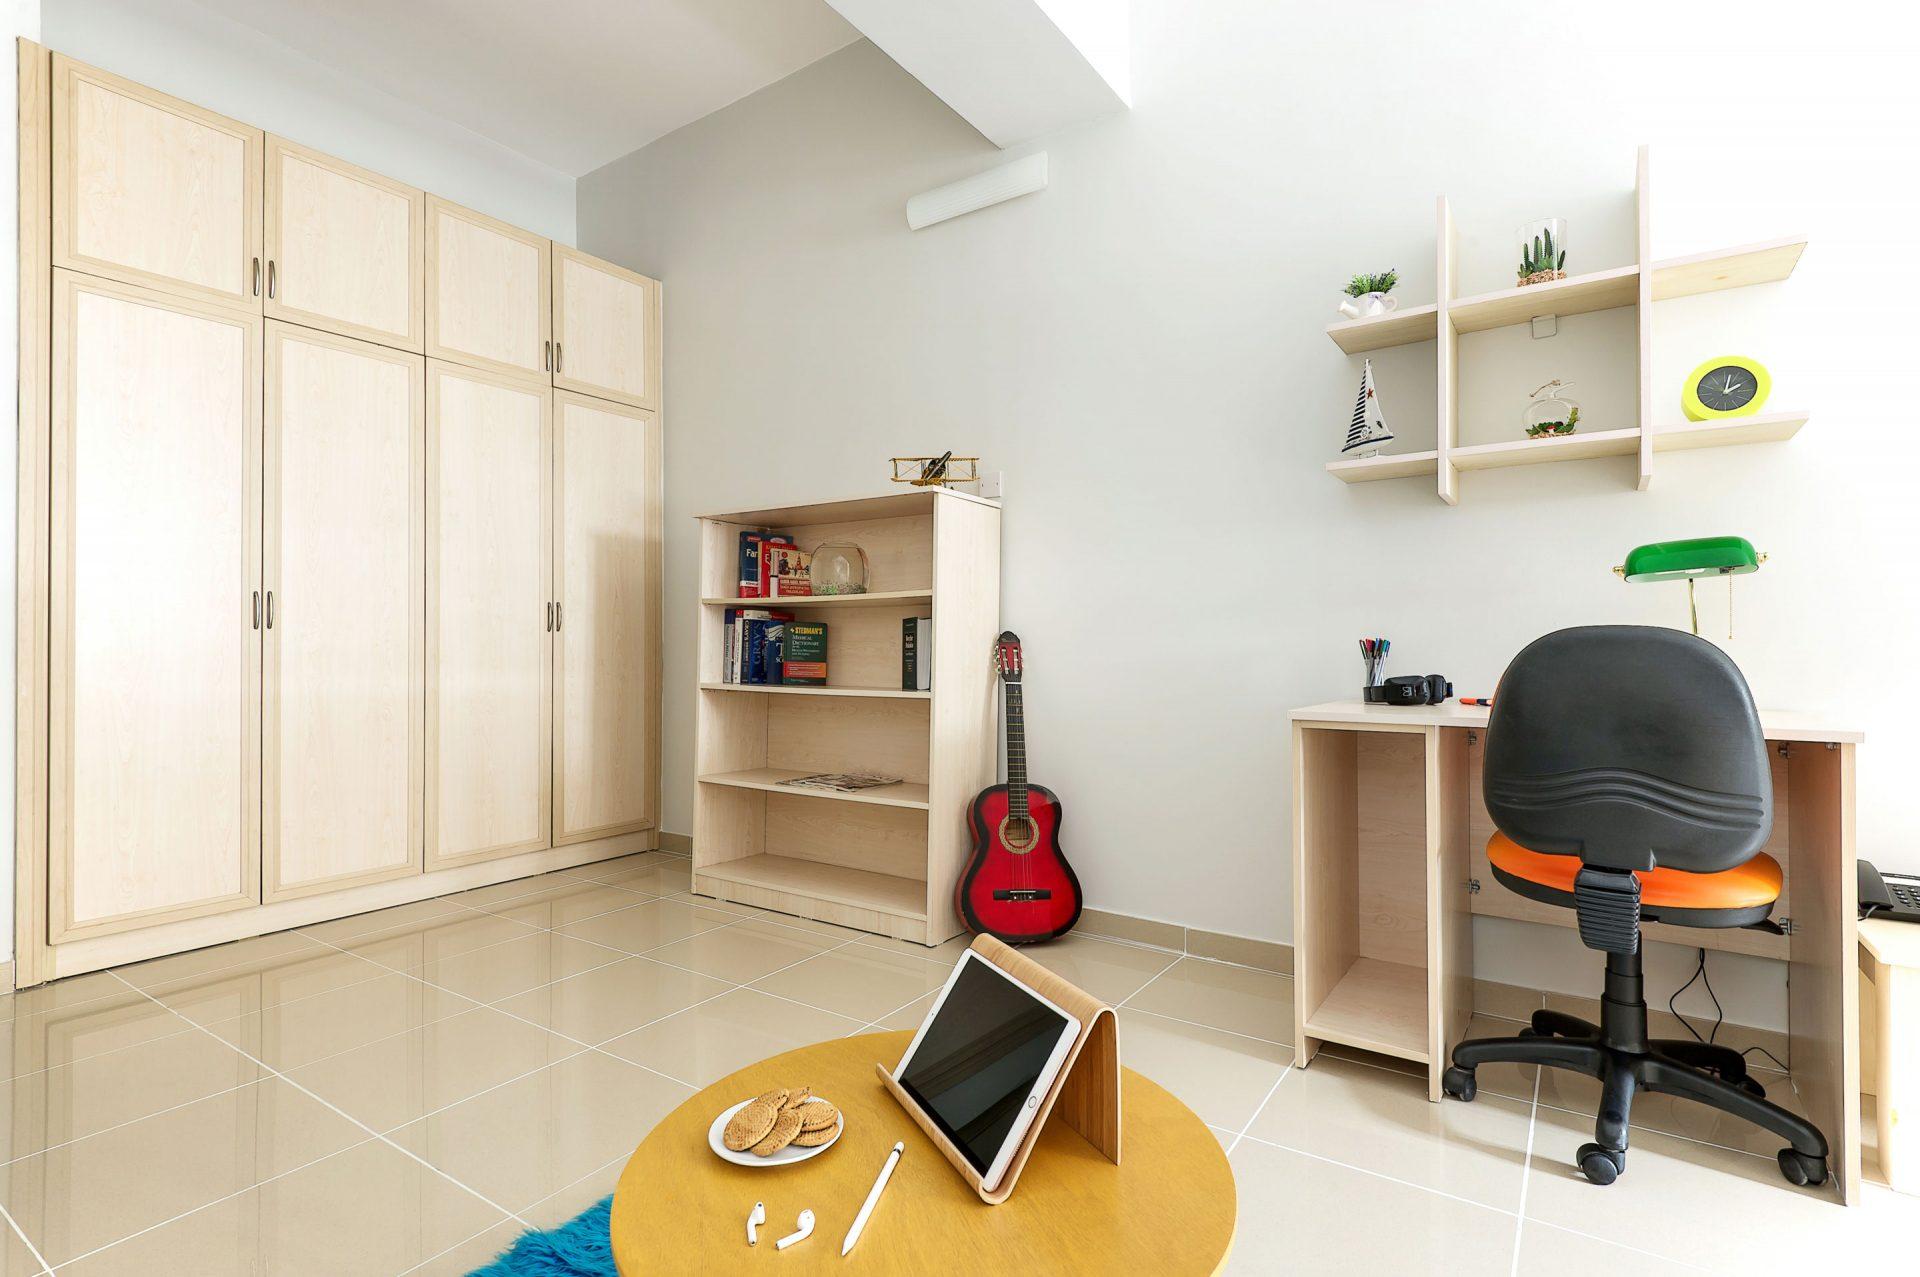 Kıbrıs'ta ucuz öğrenci hostel'i